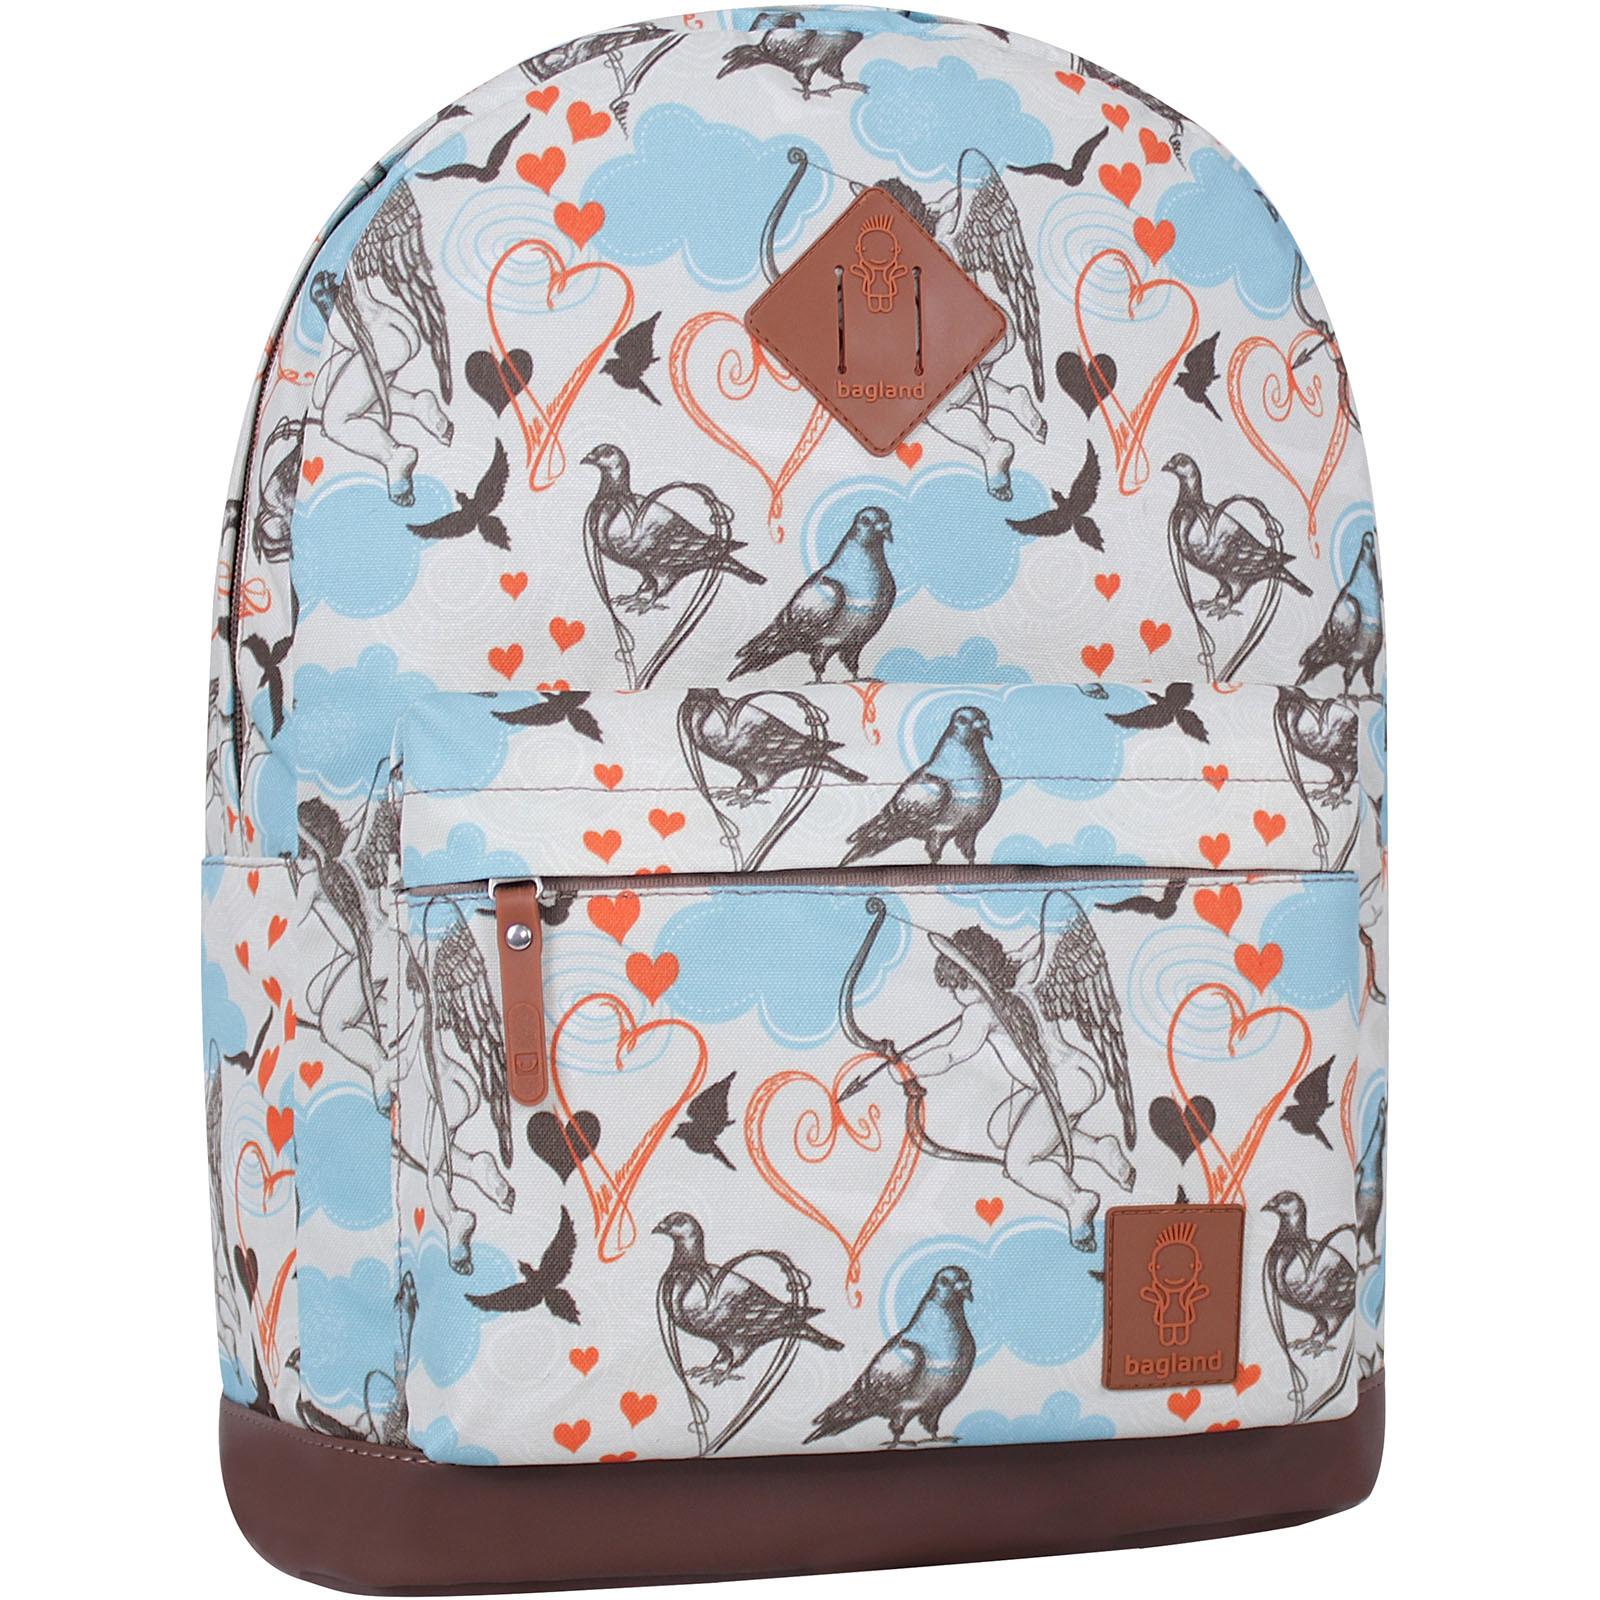 Городские рюкзаки Рюкзак Bagland Молодежный 17 л. сублимация (голуби) (005336640) IMG_8515_суб.88_.JPG